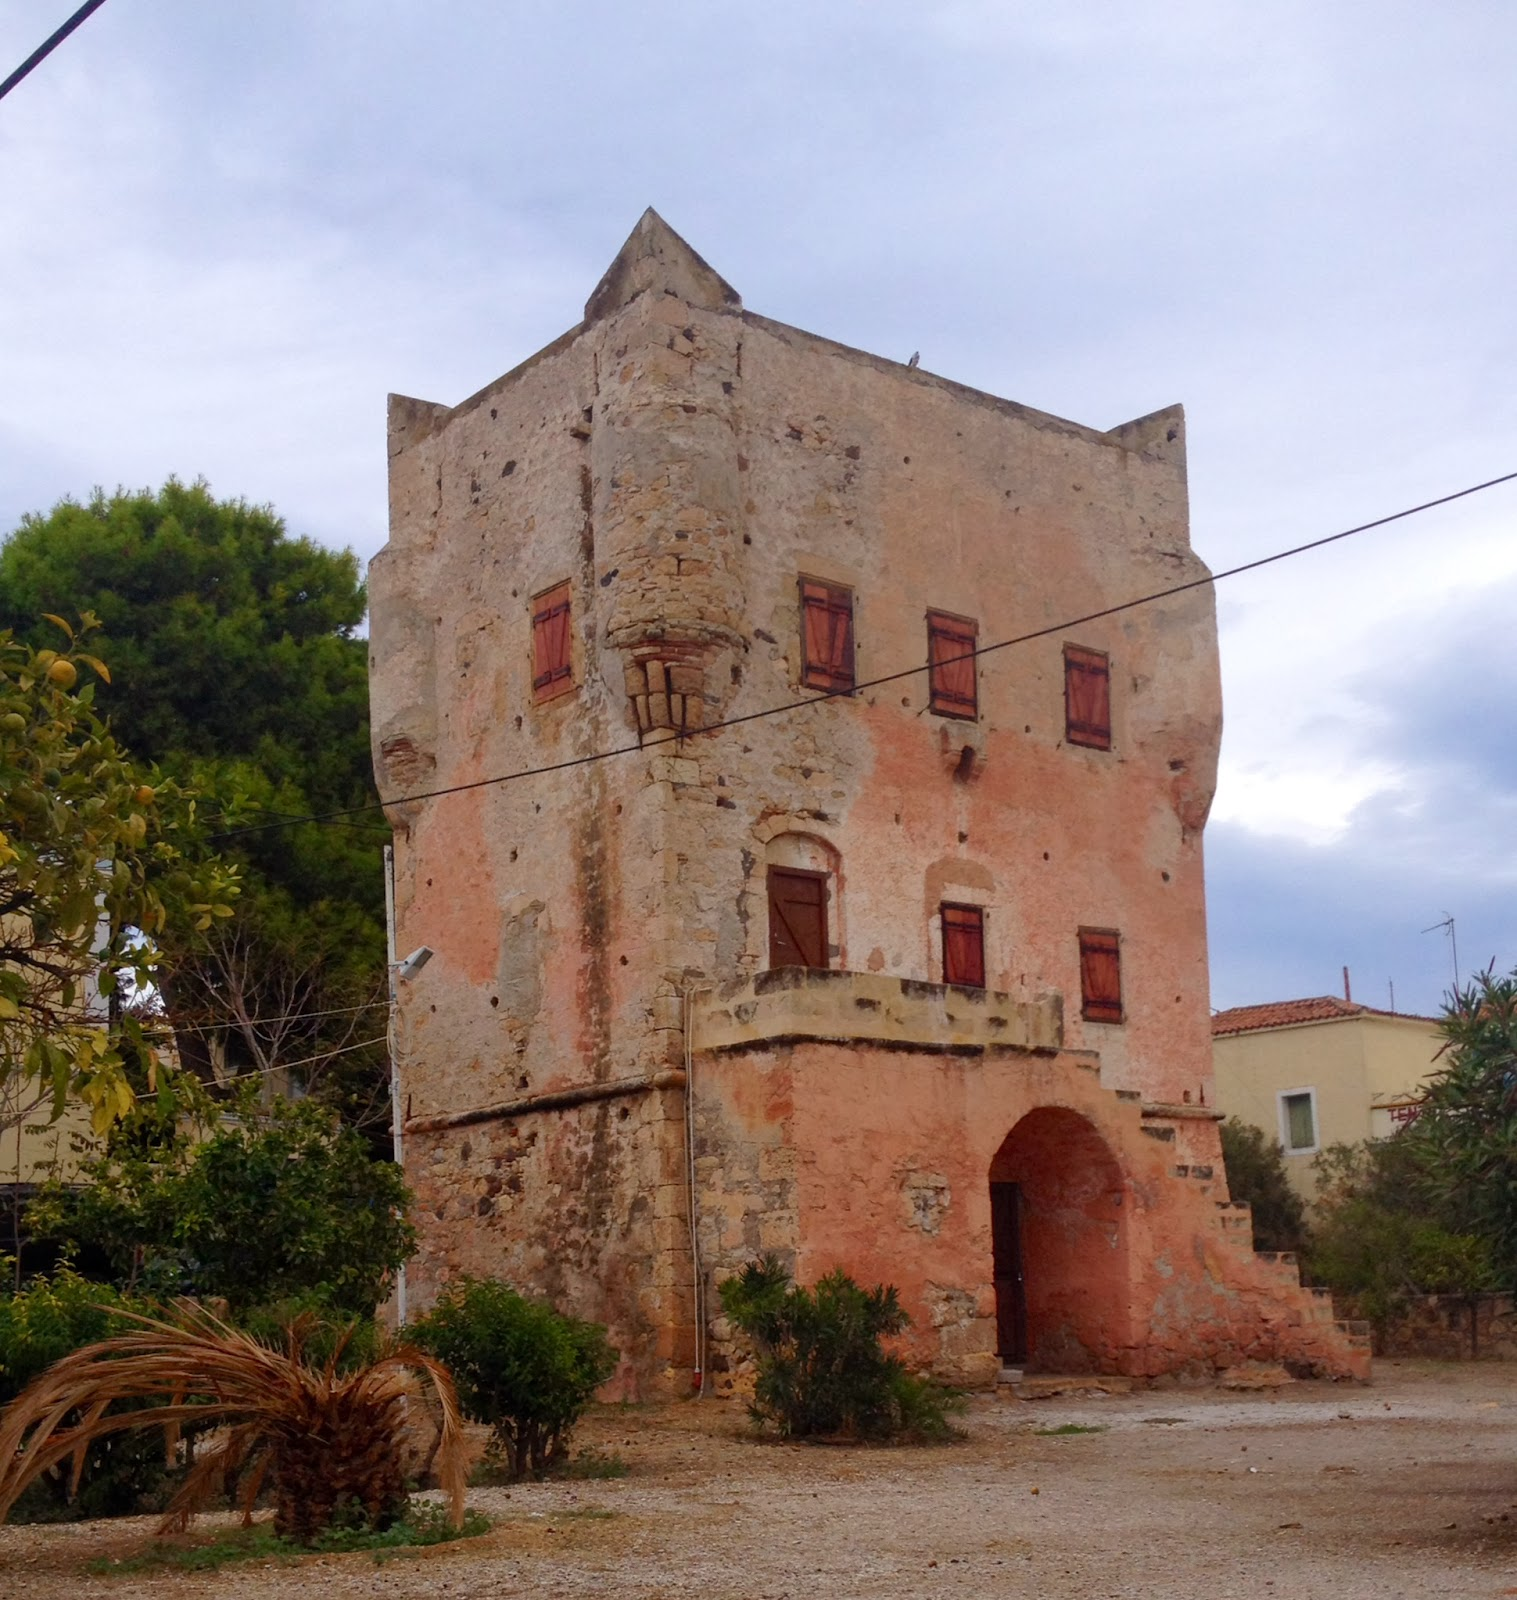 Tower of Markellos